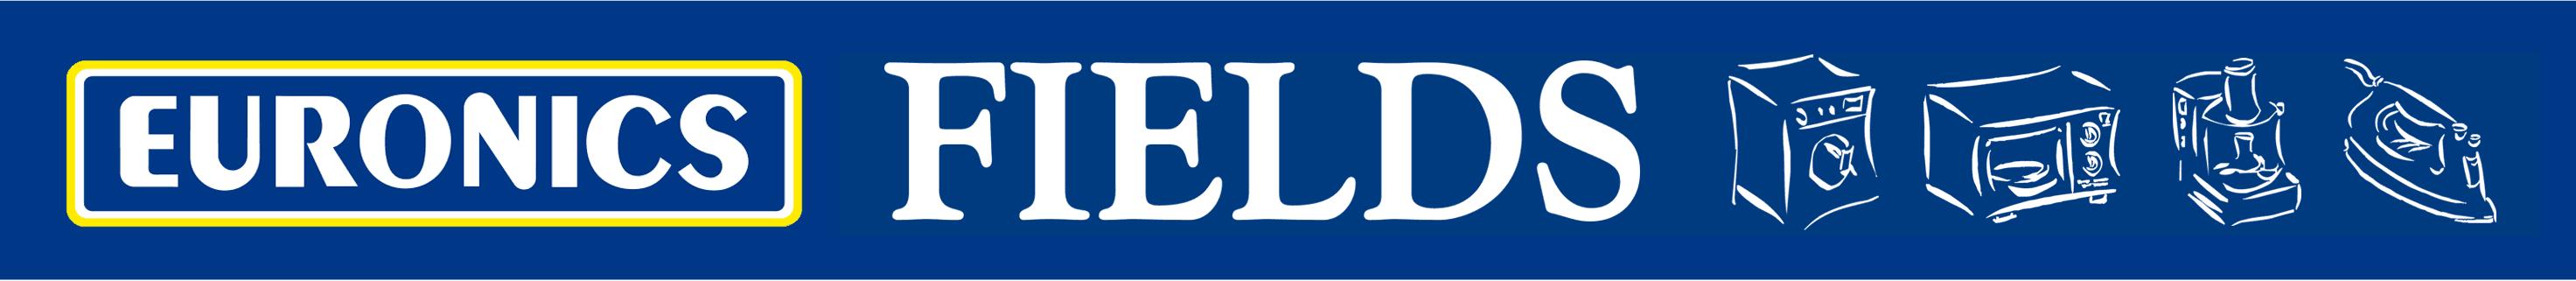 Euronics Fields logo